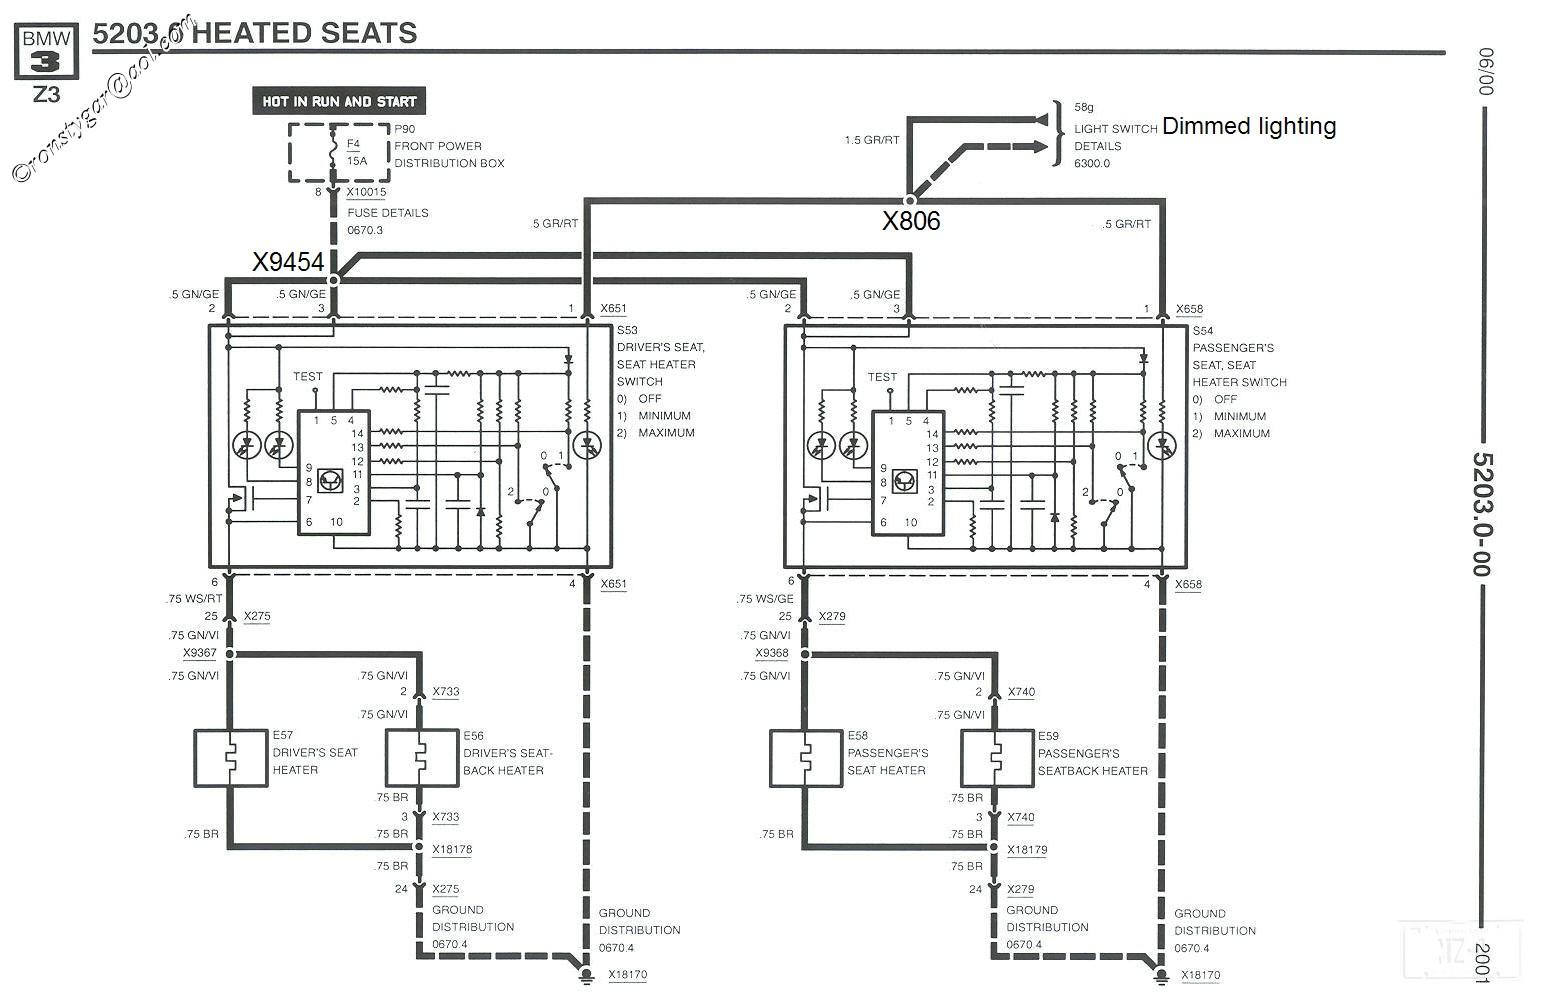 e38 seat wiring diagram harley turn signal e36 convertible top diagrams